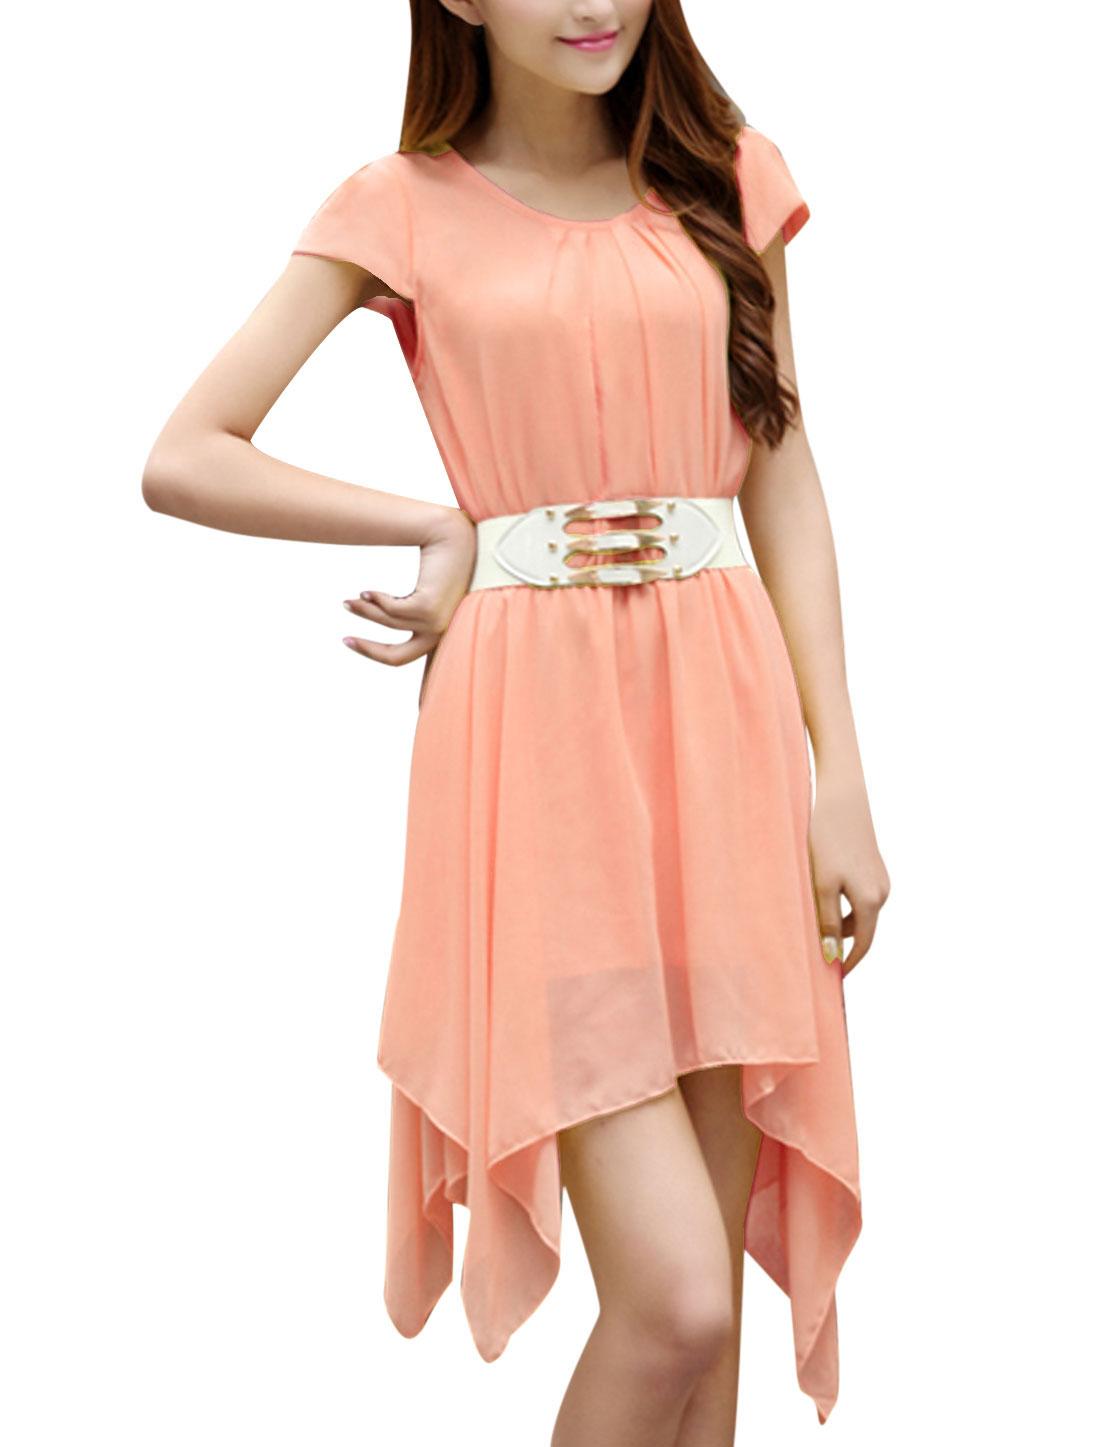 Lady Elastic Waist Low High Hem Lining Blouson Dress w Waist Belt Light Pink XS